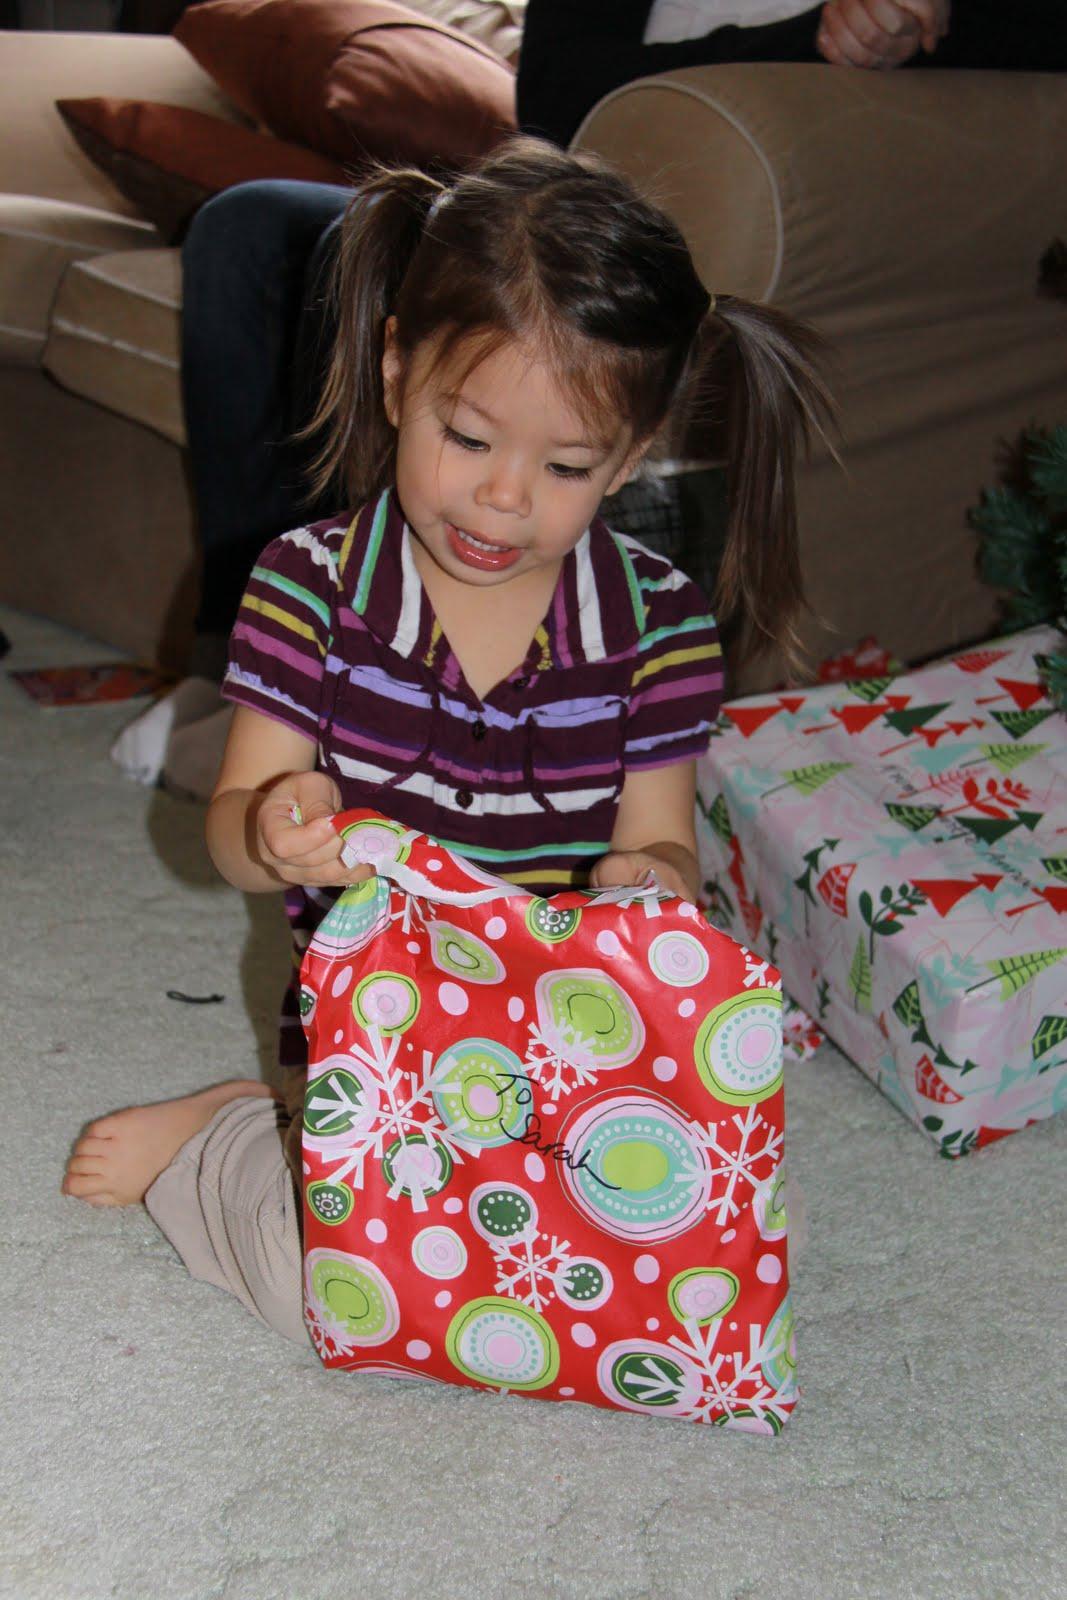 http://1.bp.blogspot.com/_S1F5UepB4qk/TRaoeRCDHYI/AAAAAAAAEmk/mx1o5vWdw2Y/s1600/Christmas%2BEve%2B001.JPG